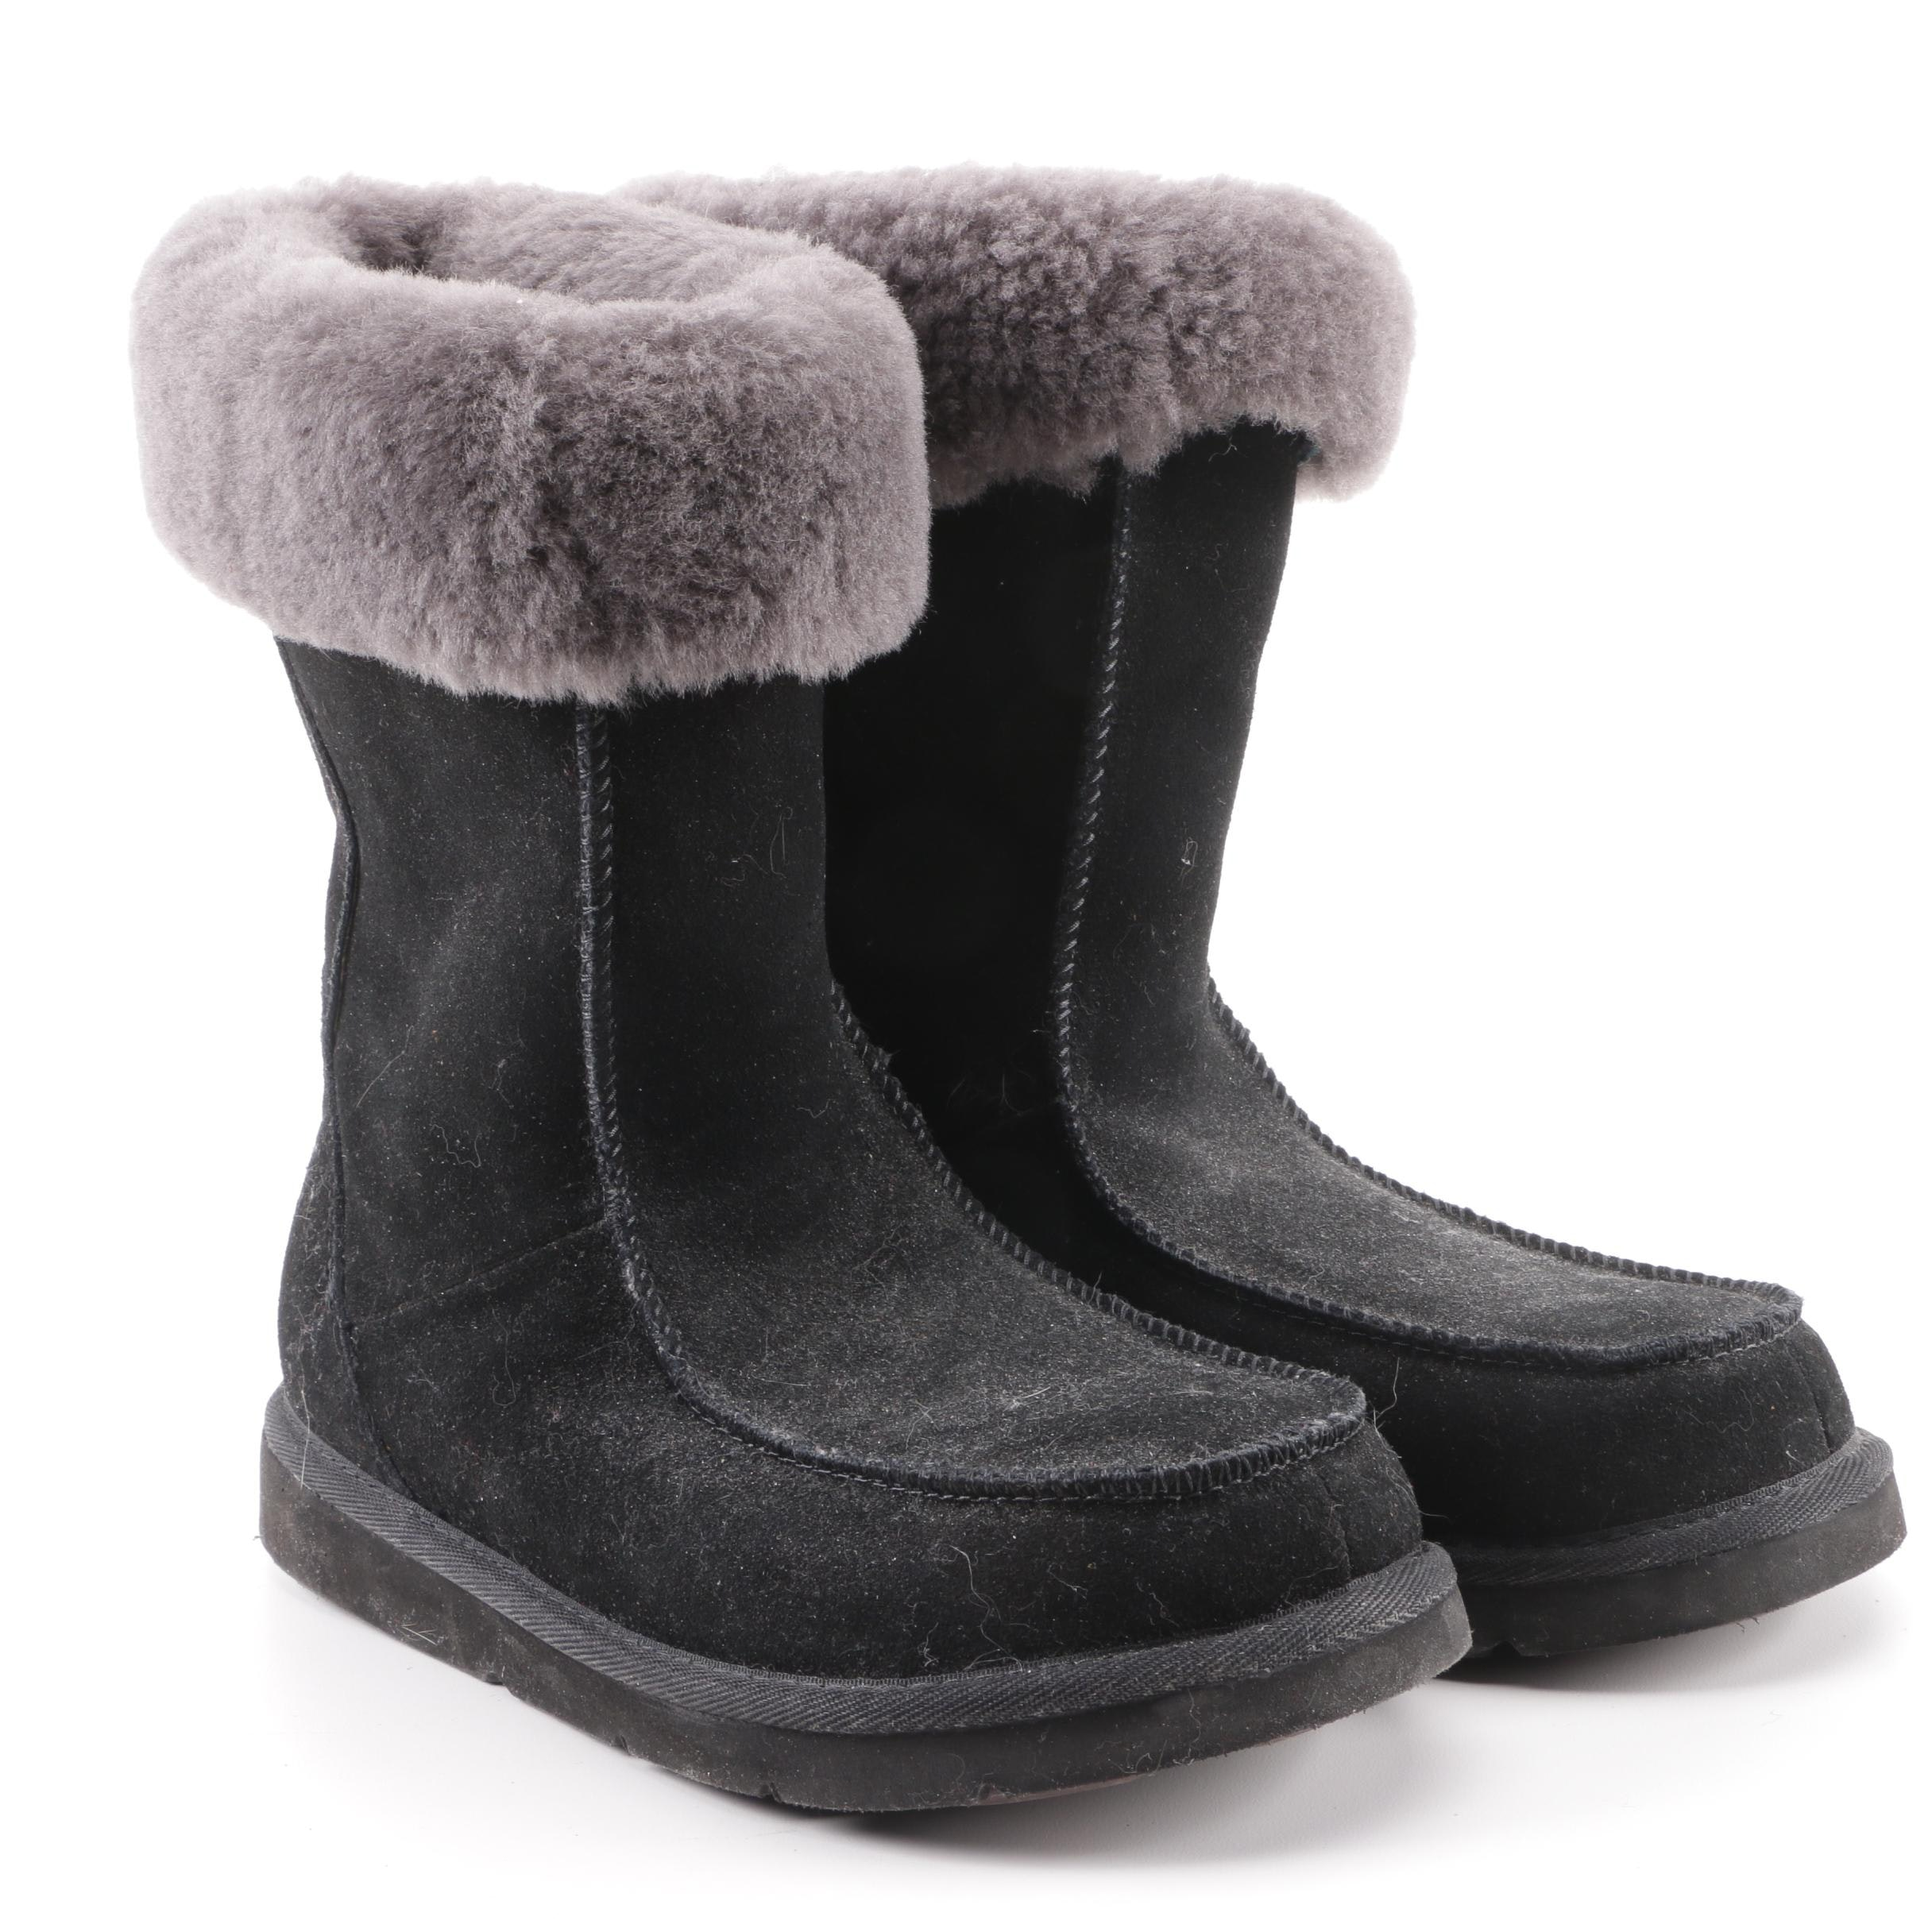 UGG Black Sheepskin Suede Gray Shearling Boots